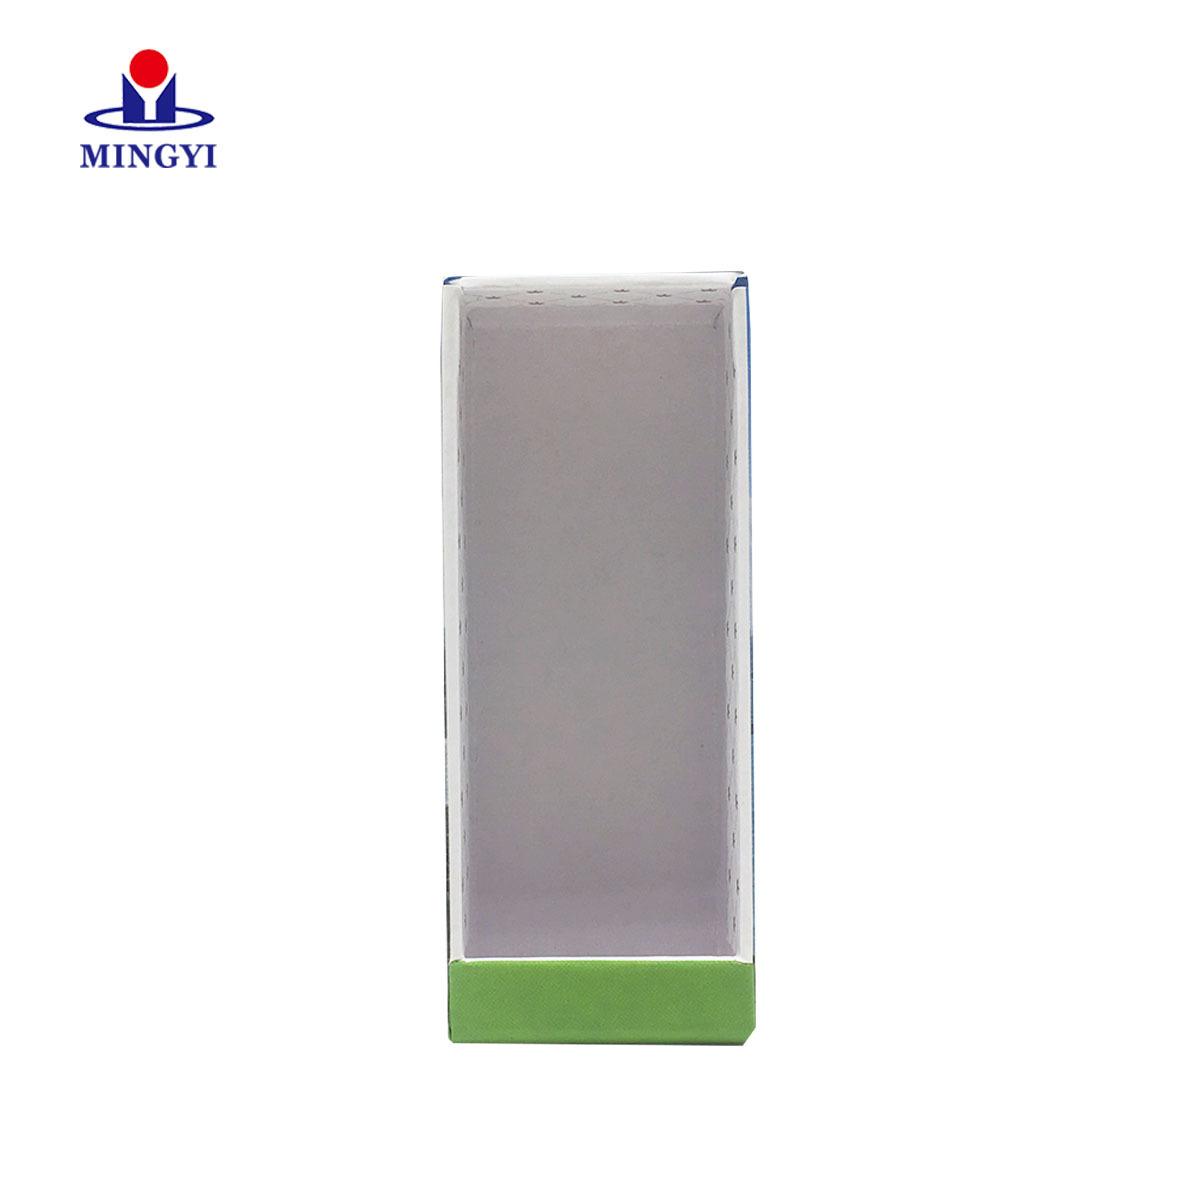 Luxury cosmetic sachet wax melts bundle hair cbd cartridge marjuana drawer shape packaging boxes